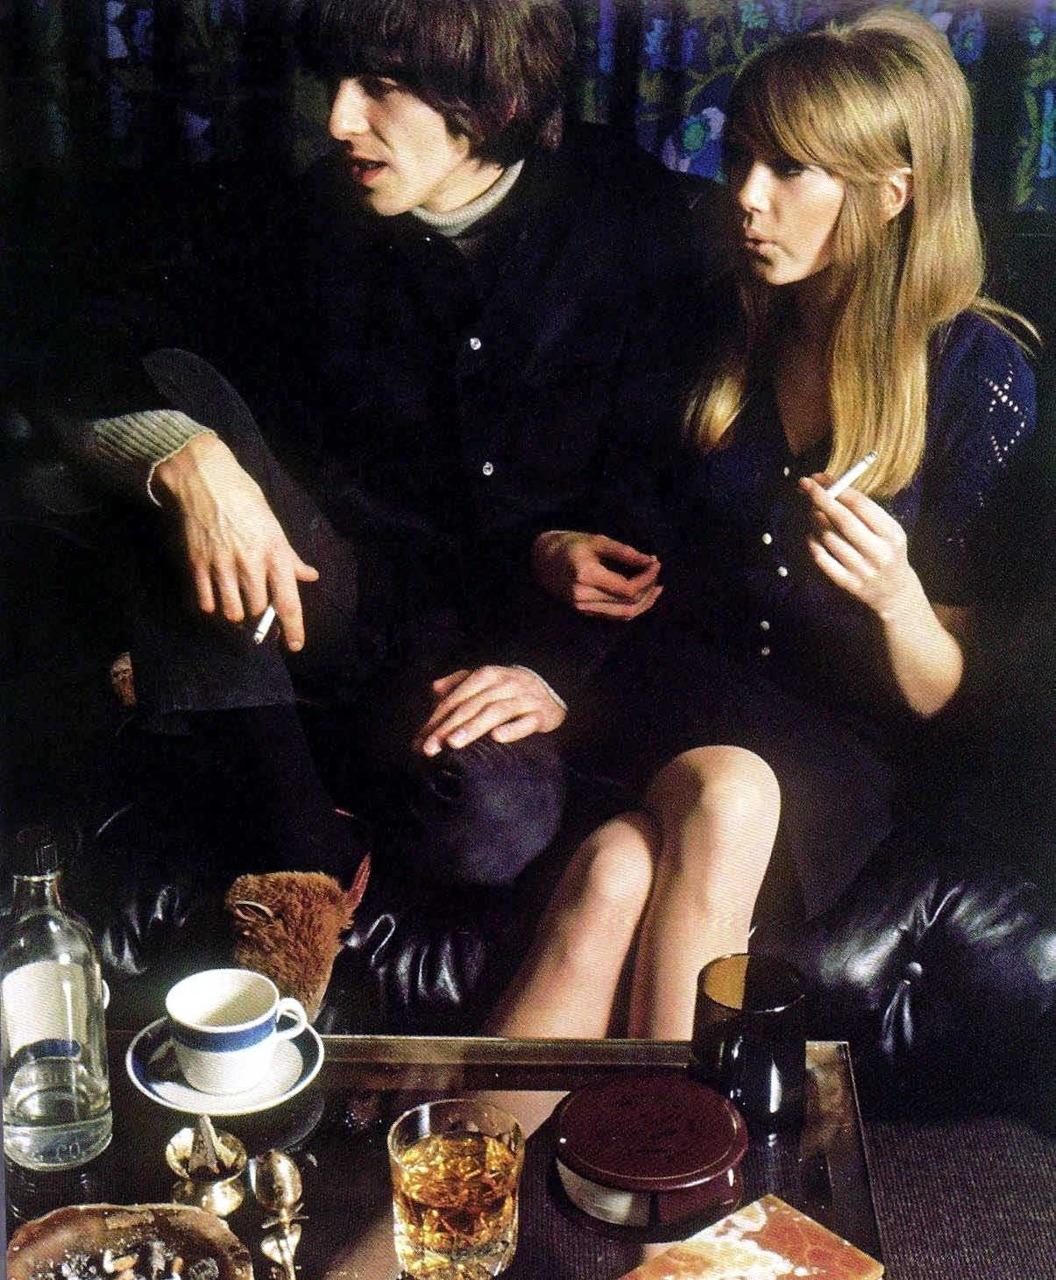 1966. Джордж Харрисон & Патти Бойд